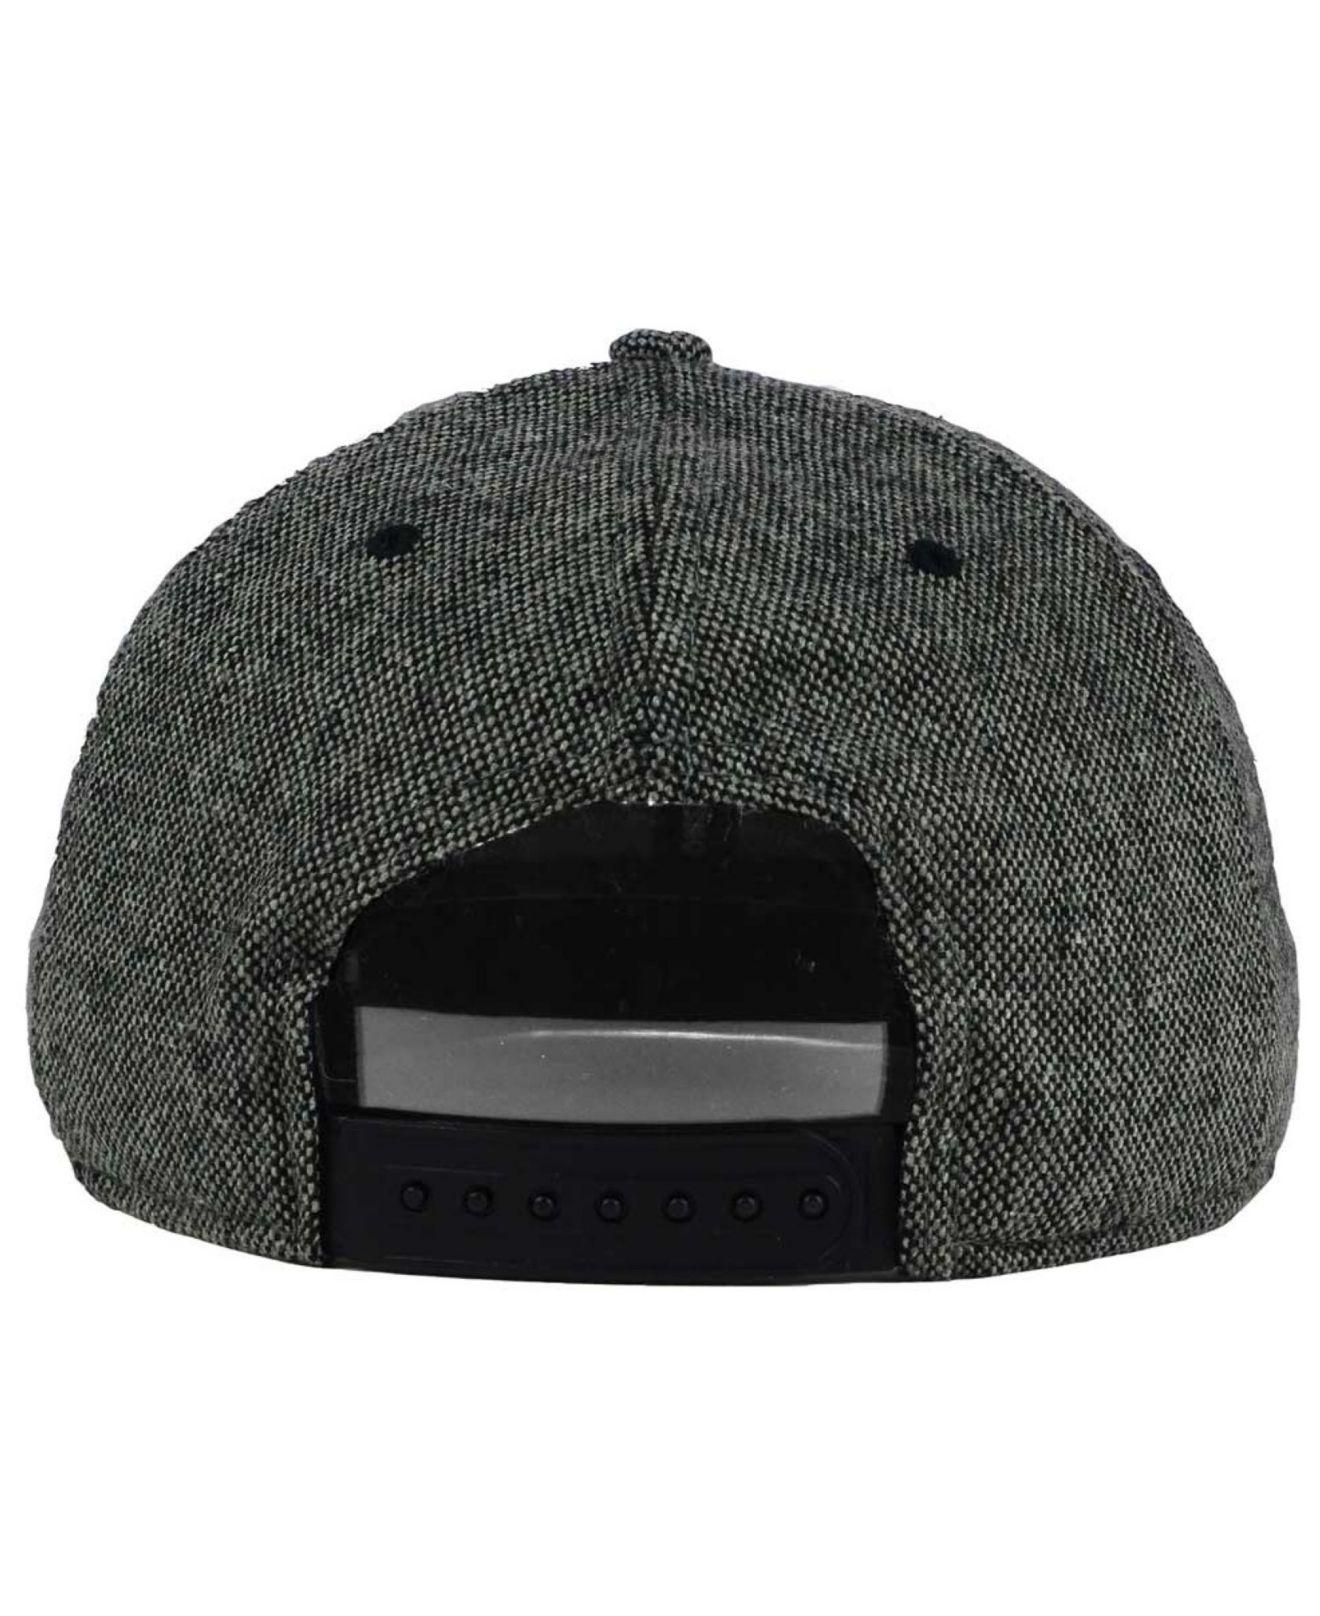 brand new a4f17 14fc1 ... netherlands lyst nike oregon ducks true tweed snapback cap in black for  men 1f7d7 75fed